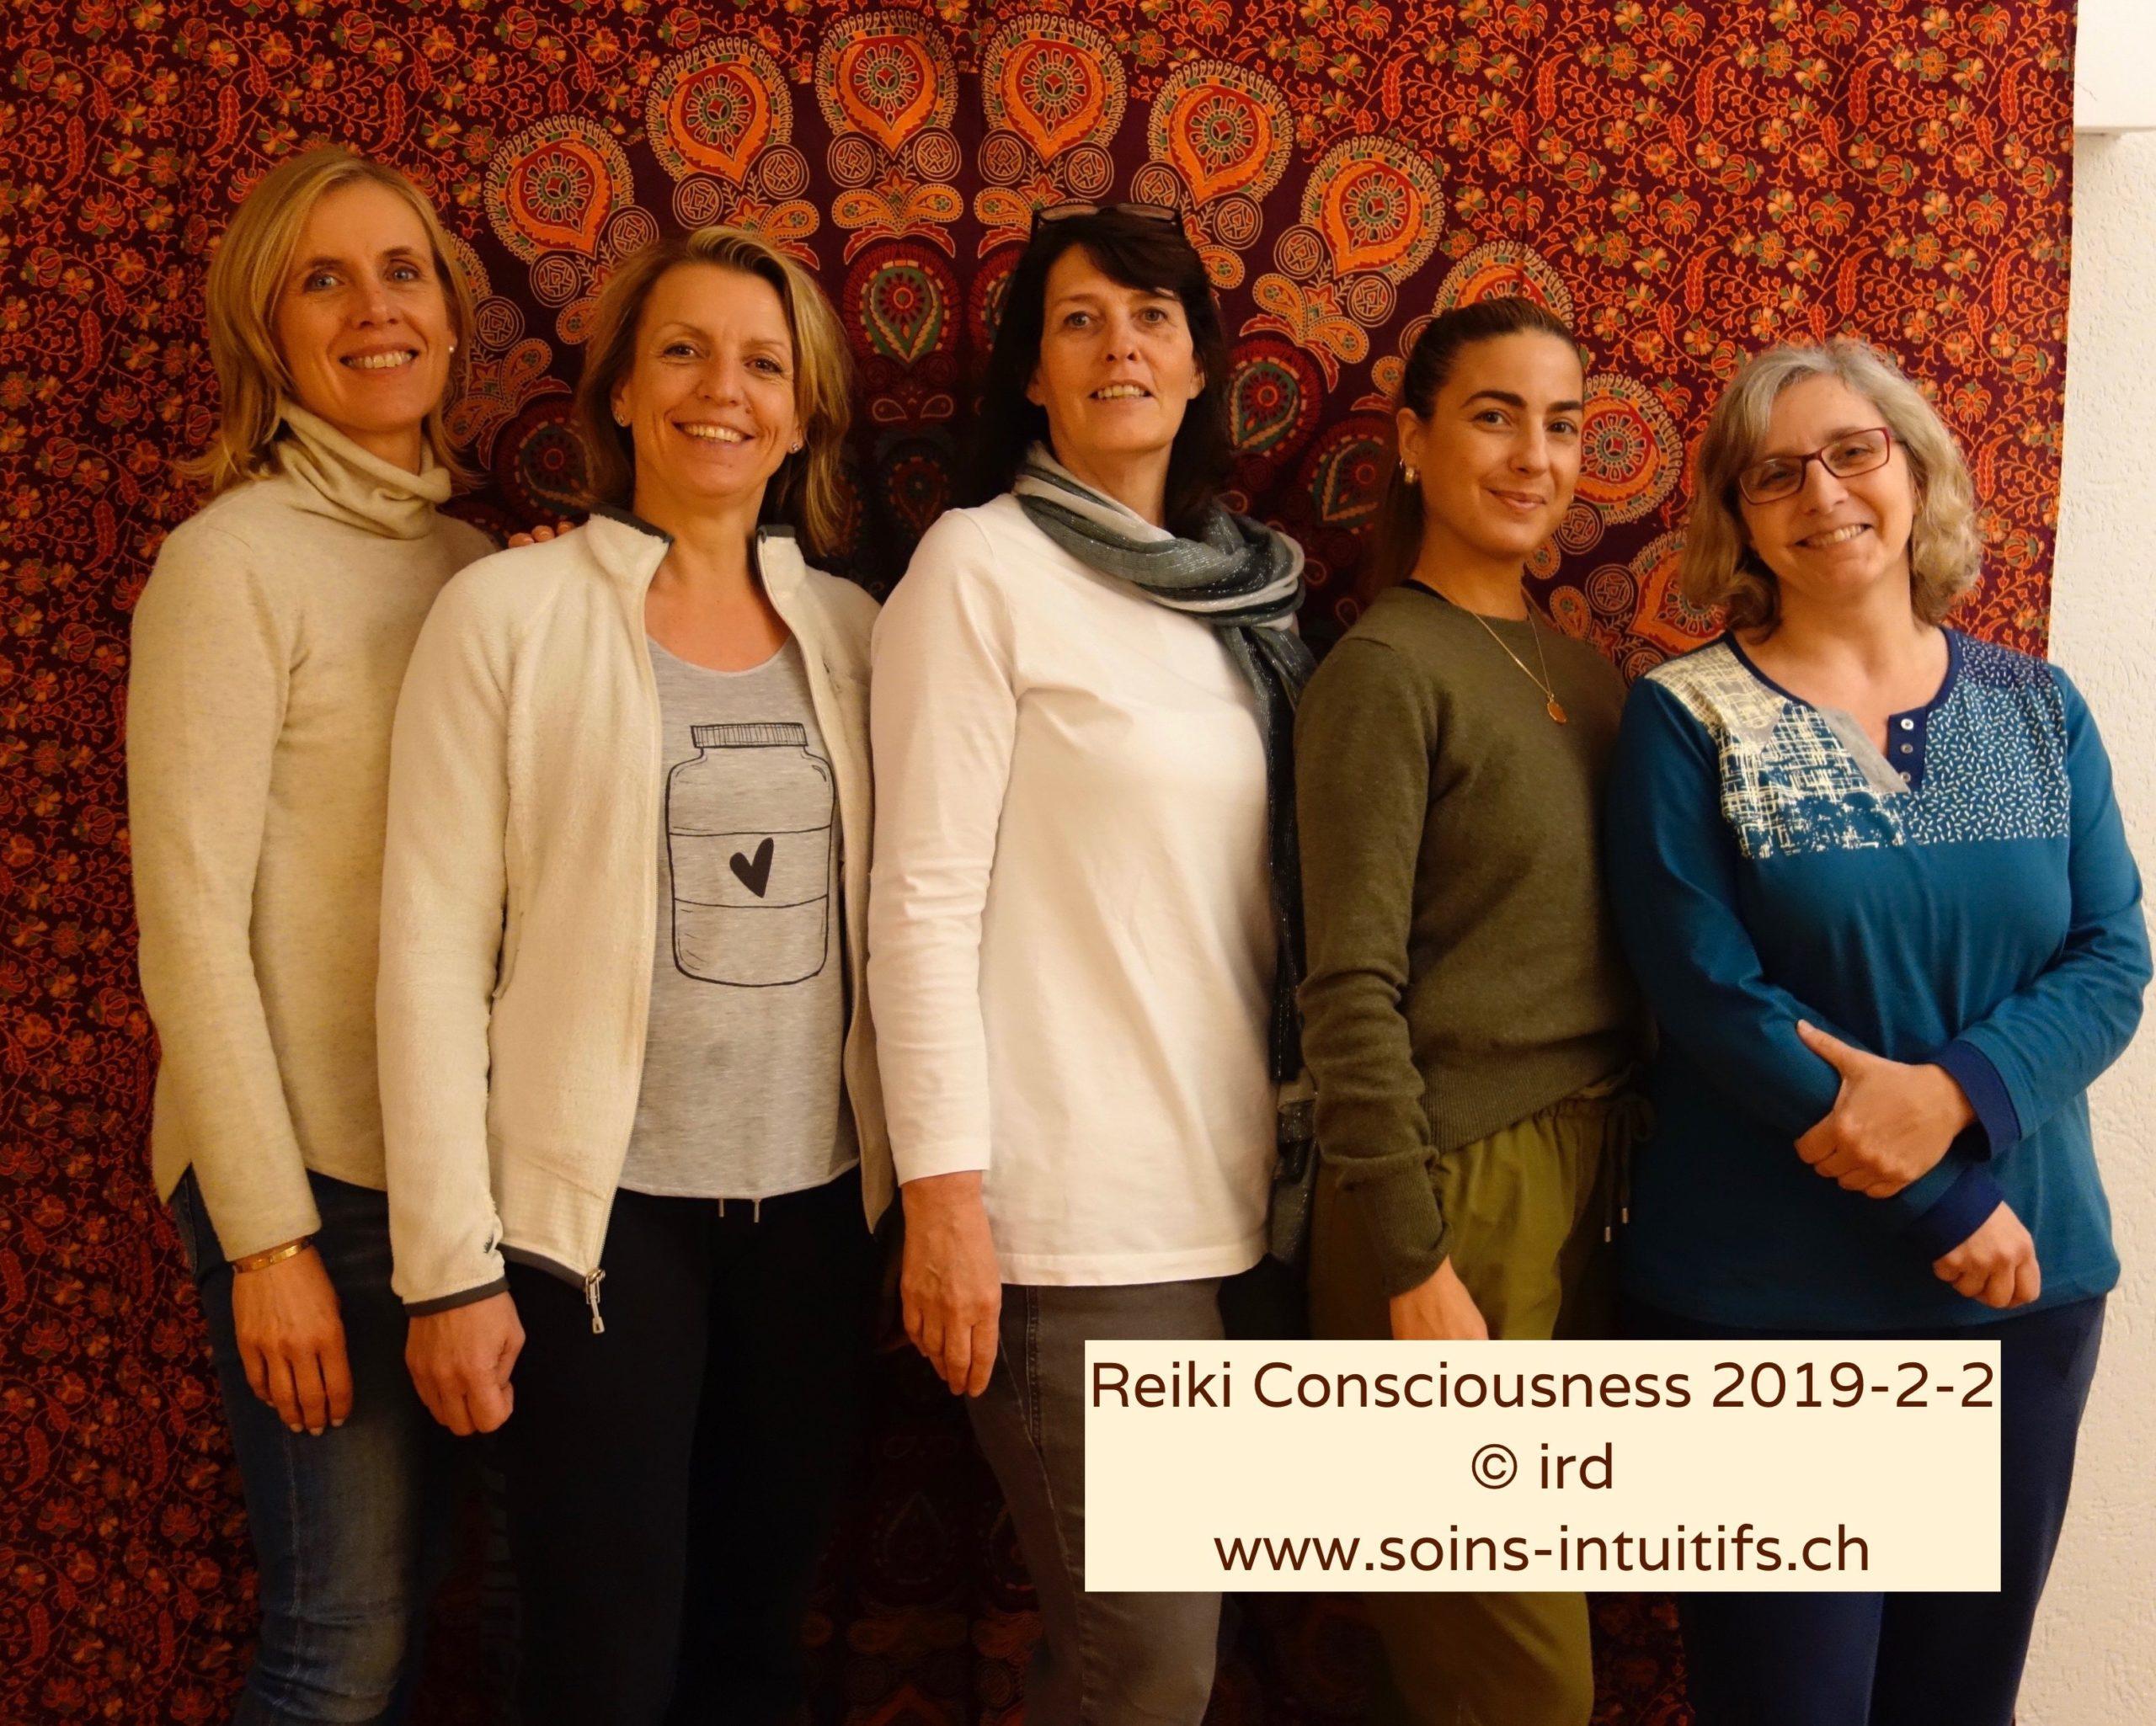 Stagiaires Reiki Consciousness - suite